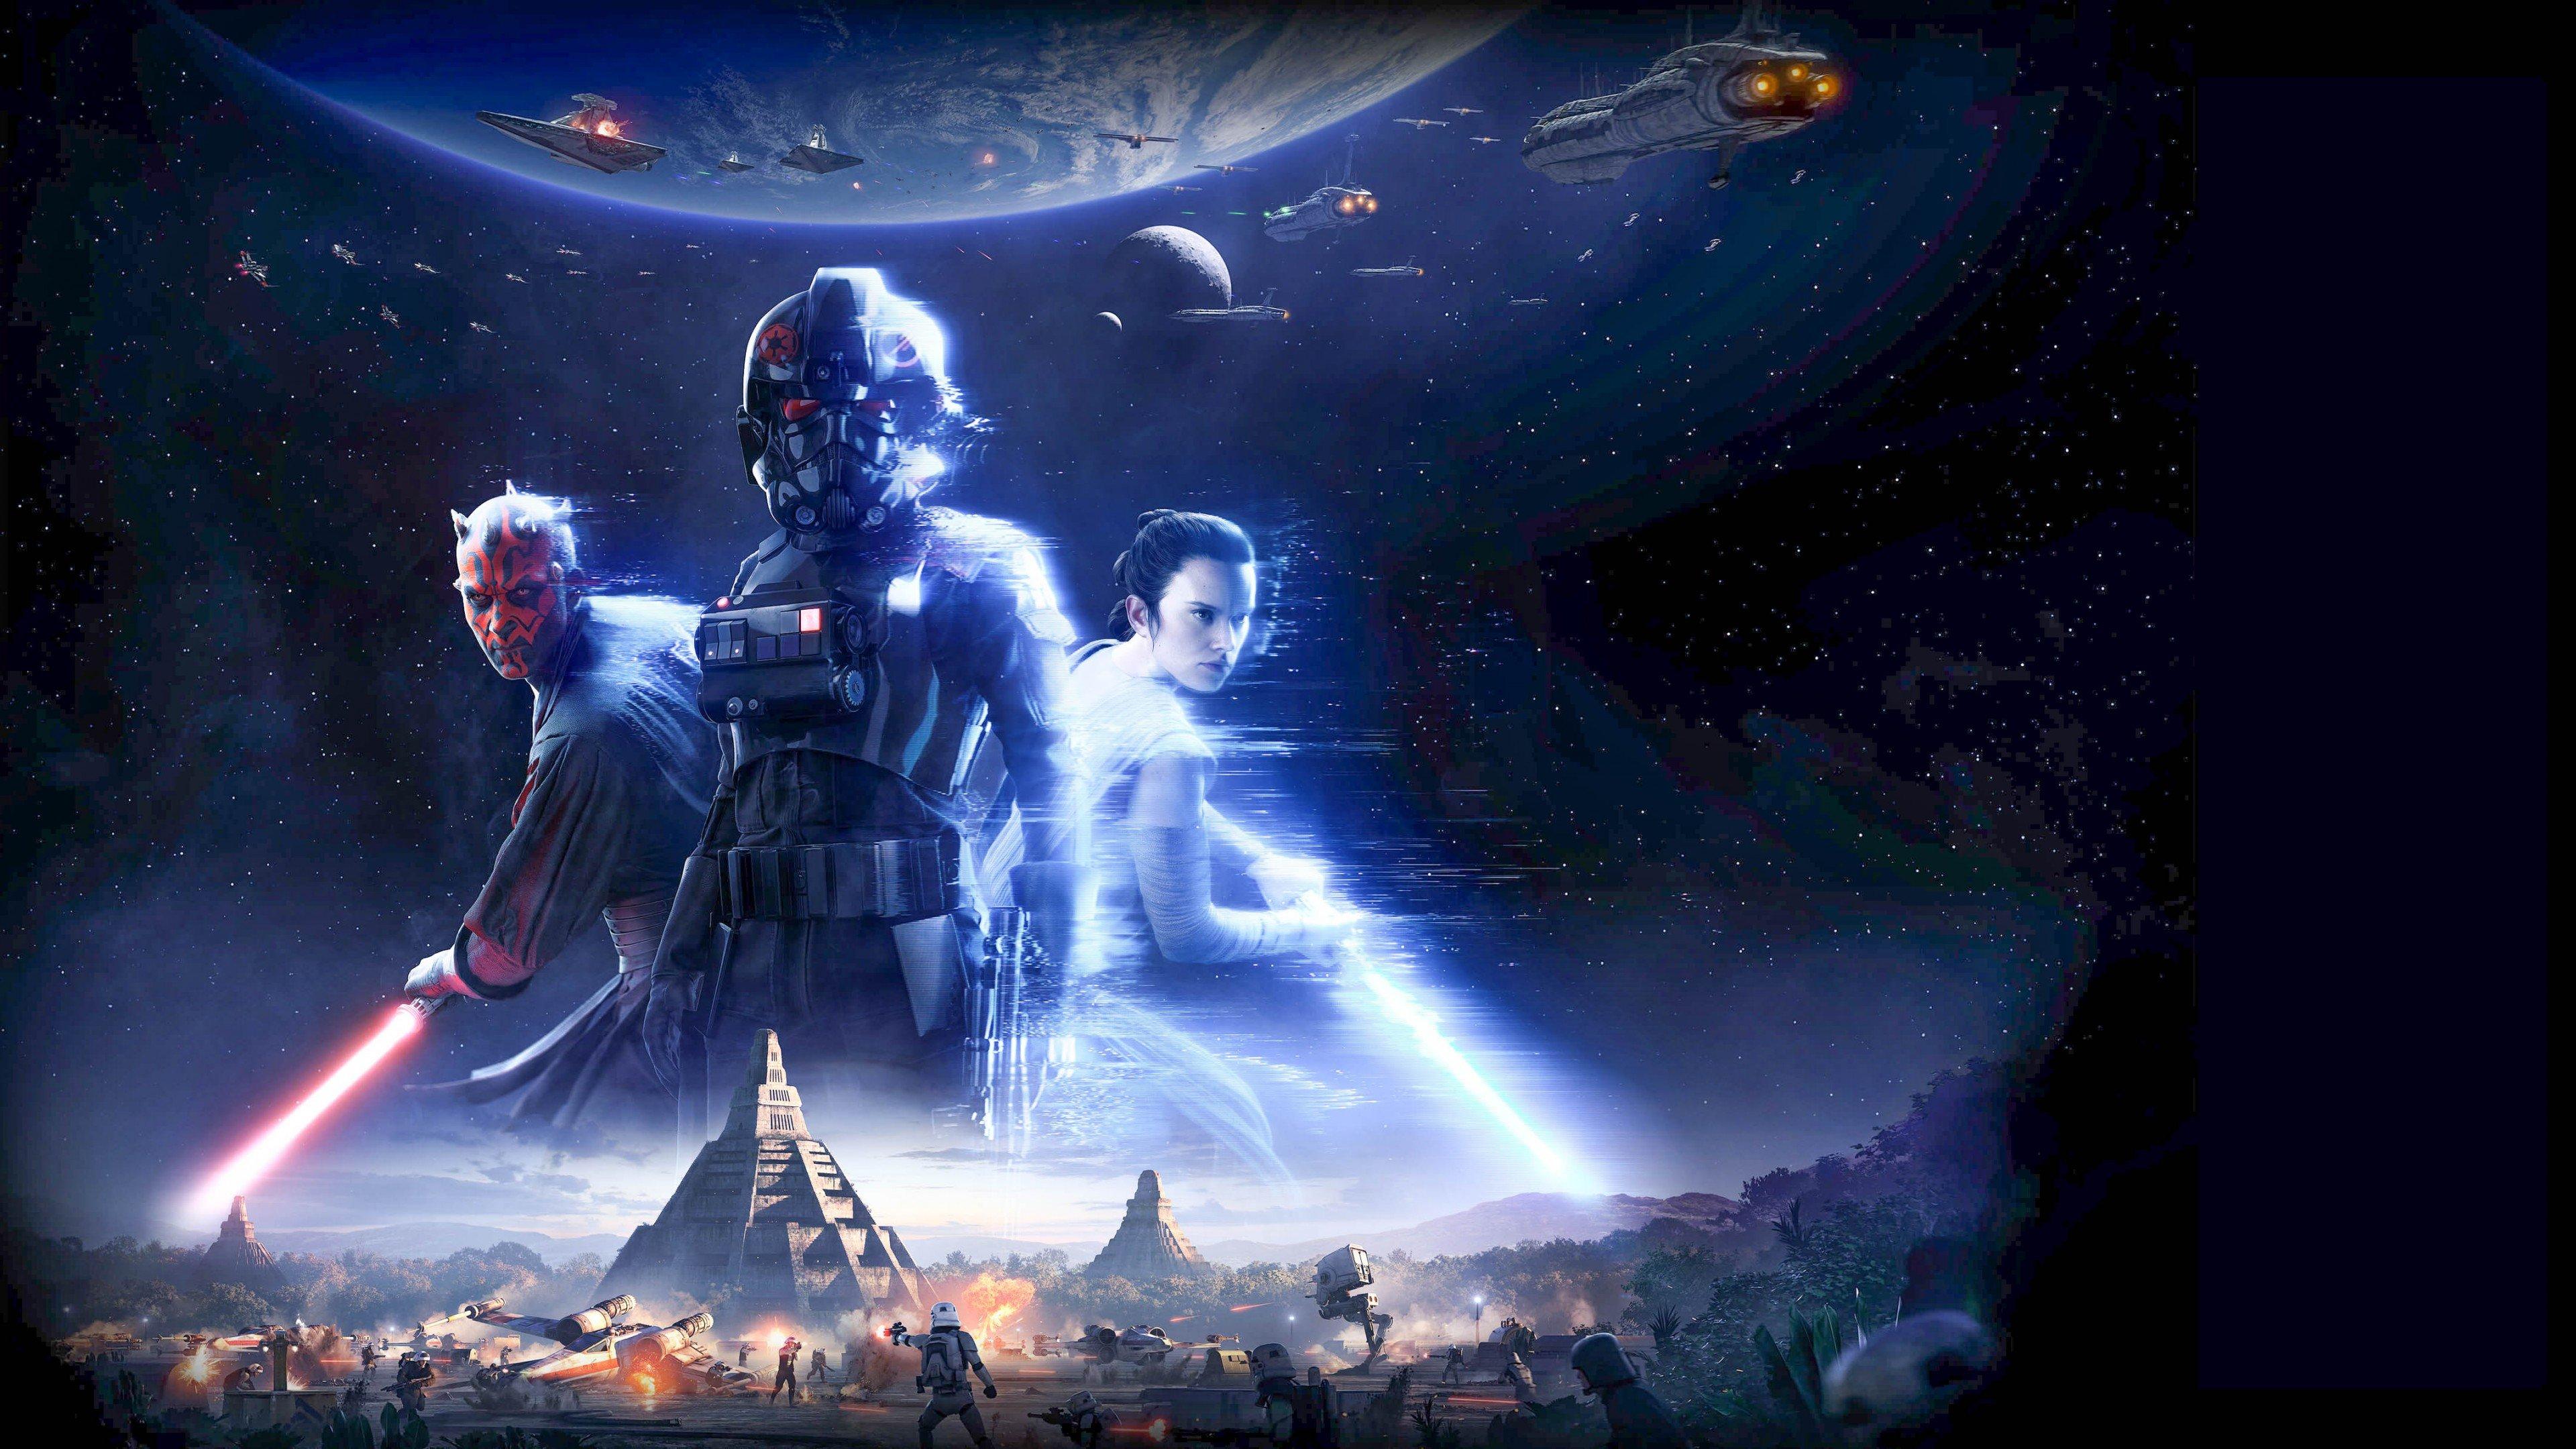 Fondos de pantalla Star Wars Battlefront II